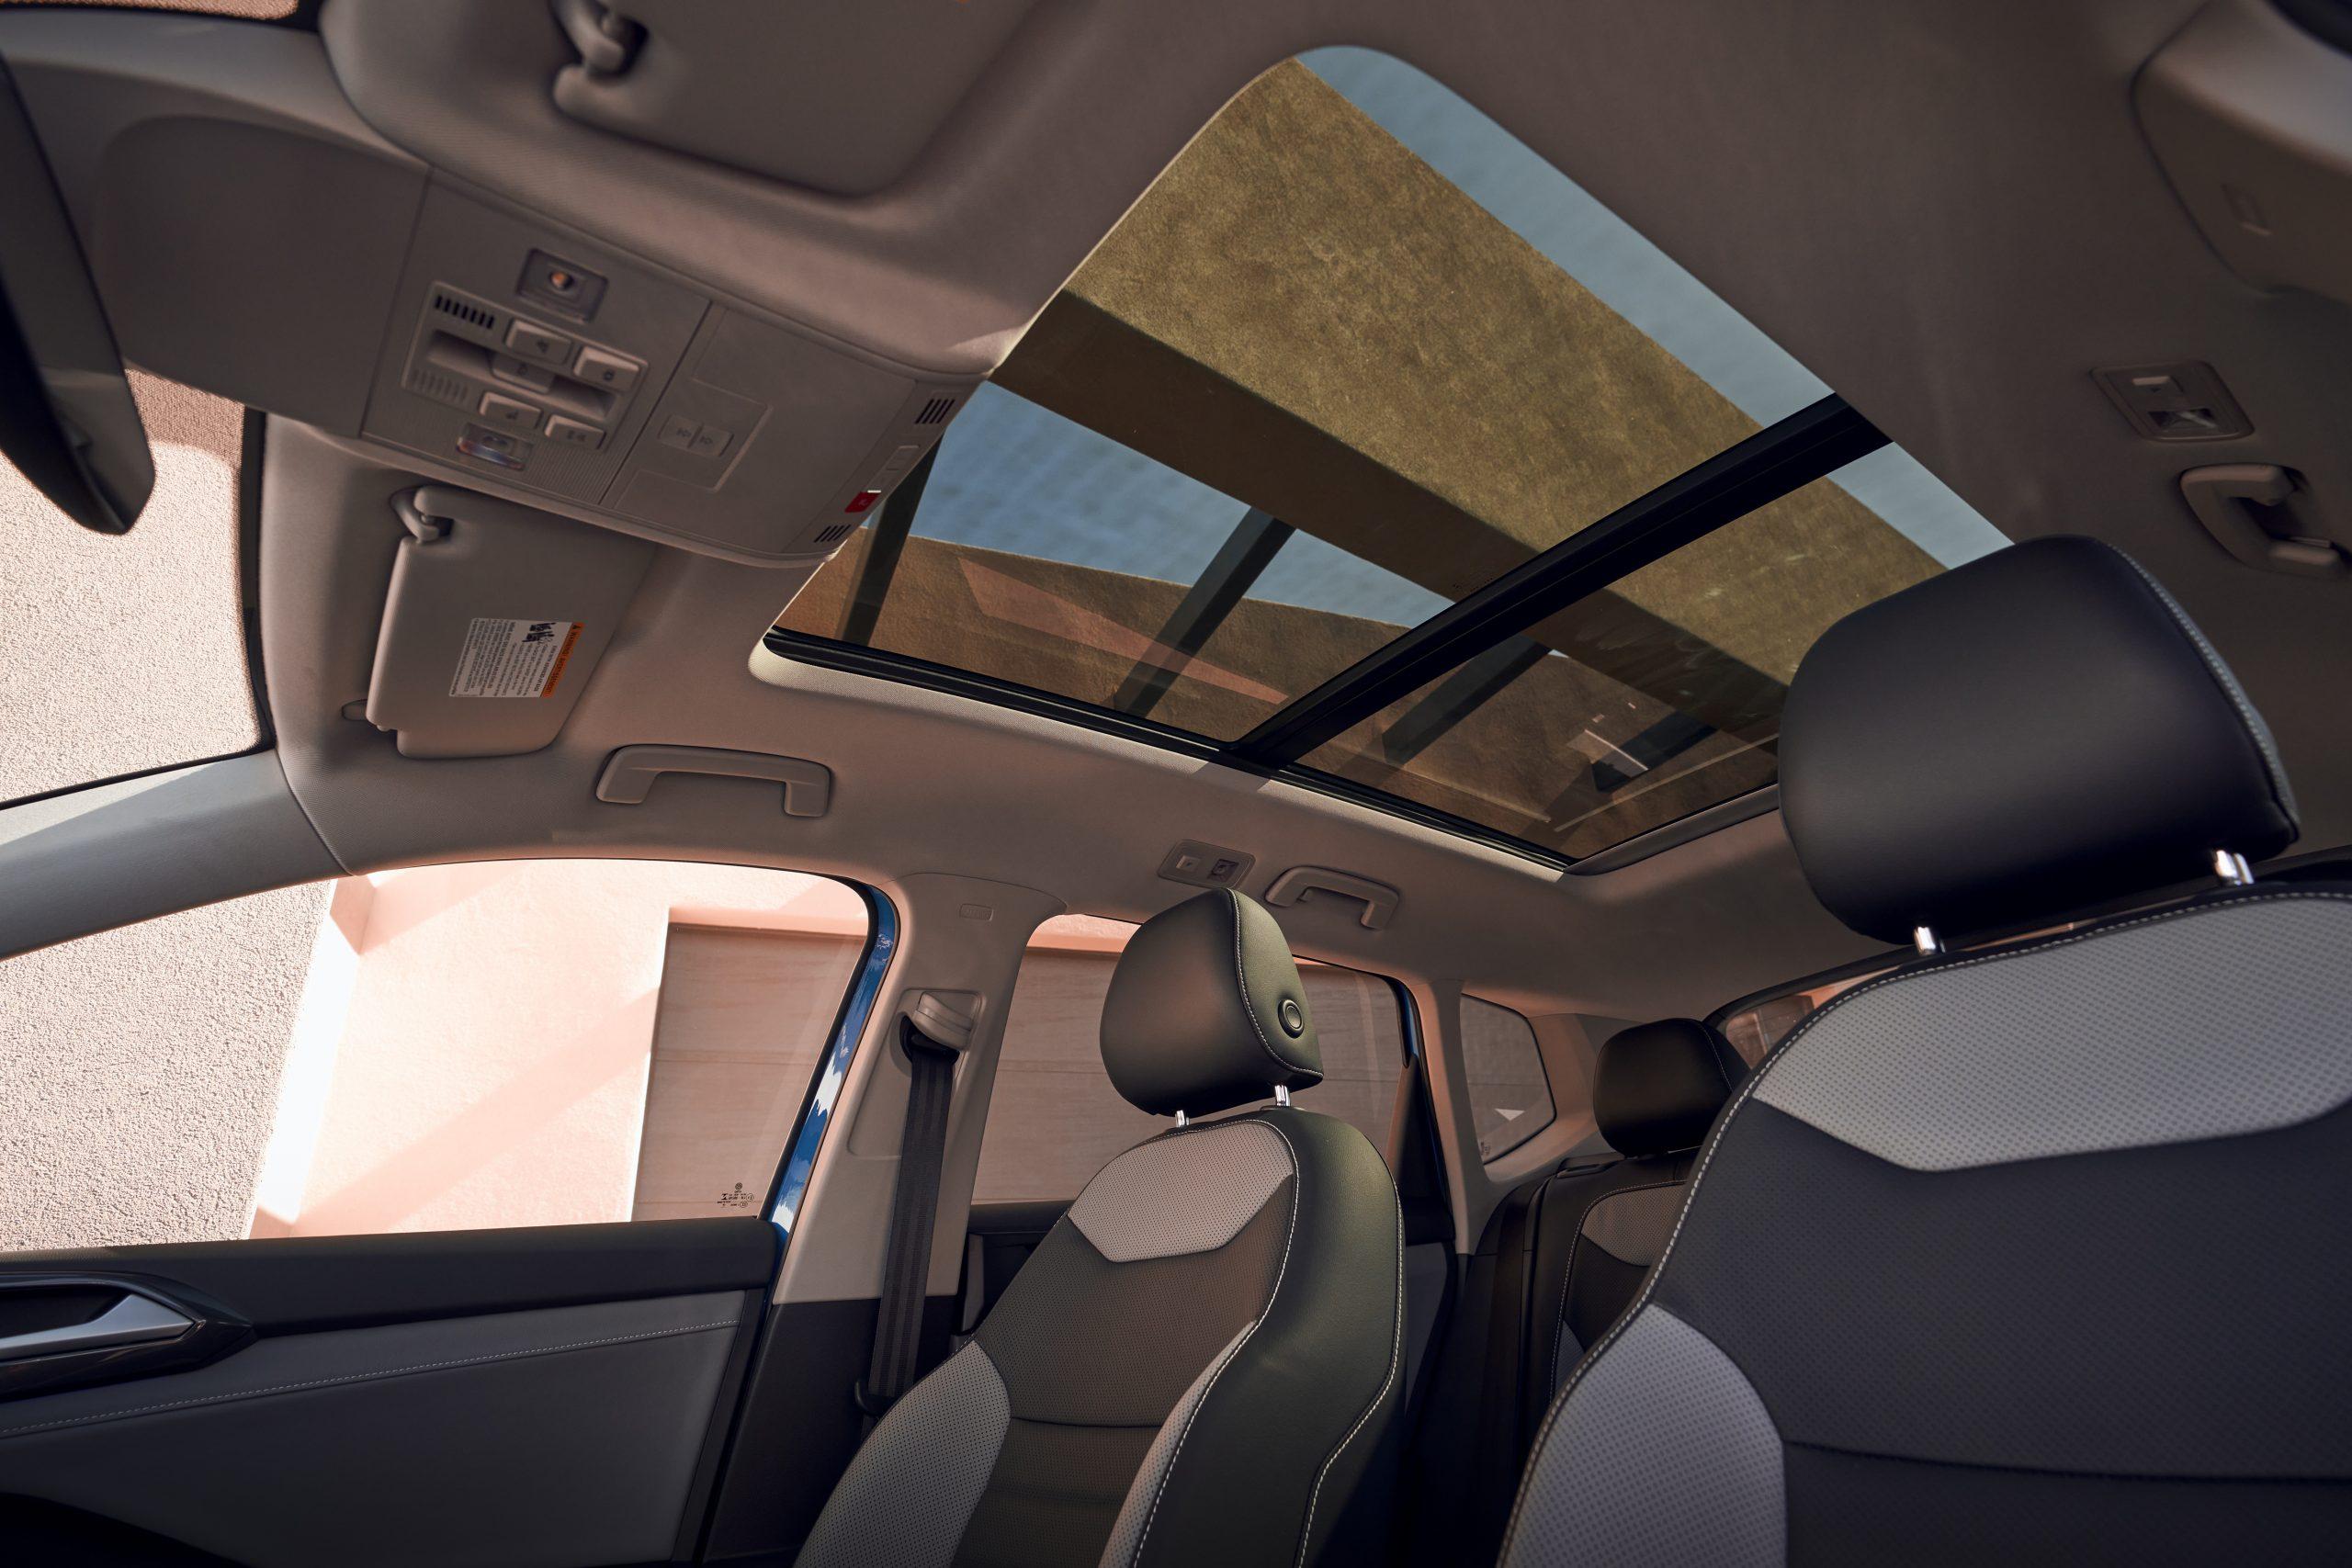 2022 Volkswagen Taos interior moonroof closed